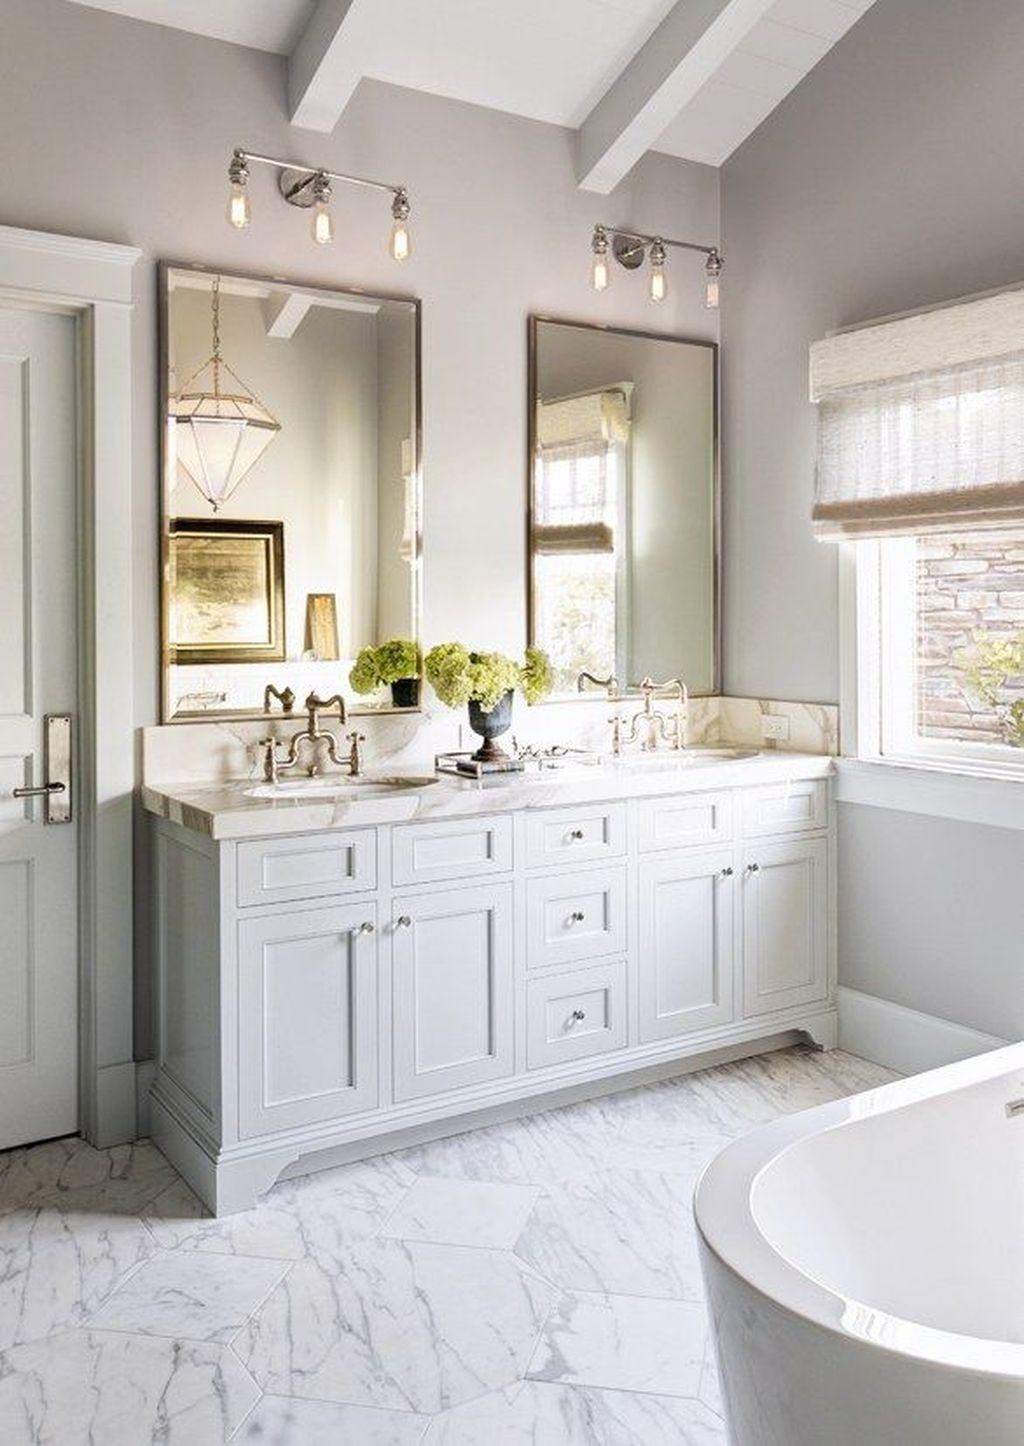 42 Fabulous Bathroom Lighting Ideas Trendehouse Bathroom Remodel Master Bathrooms Remodel Bathroom Mirror Design